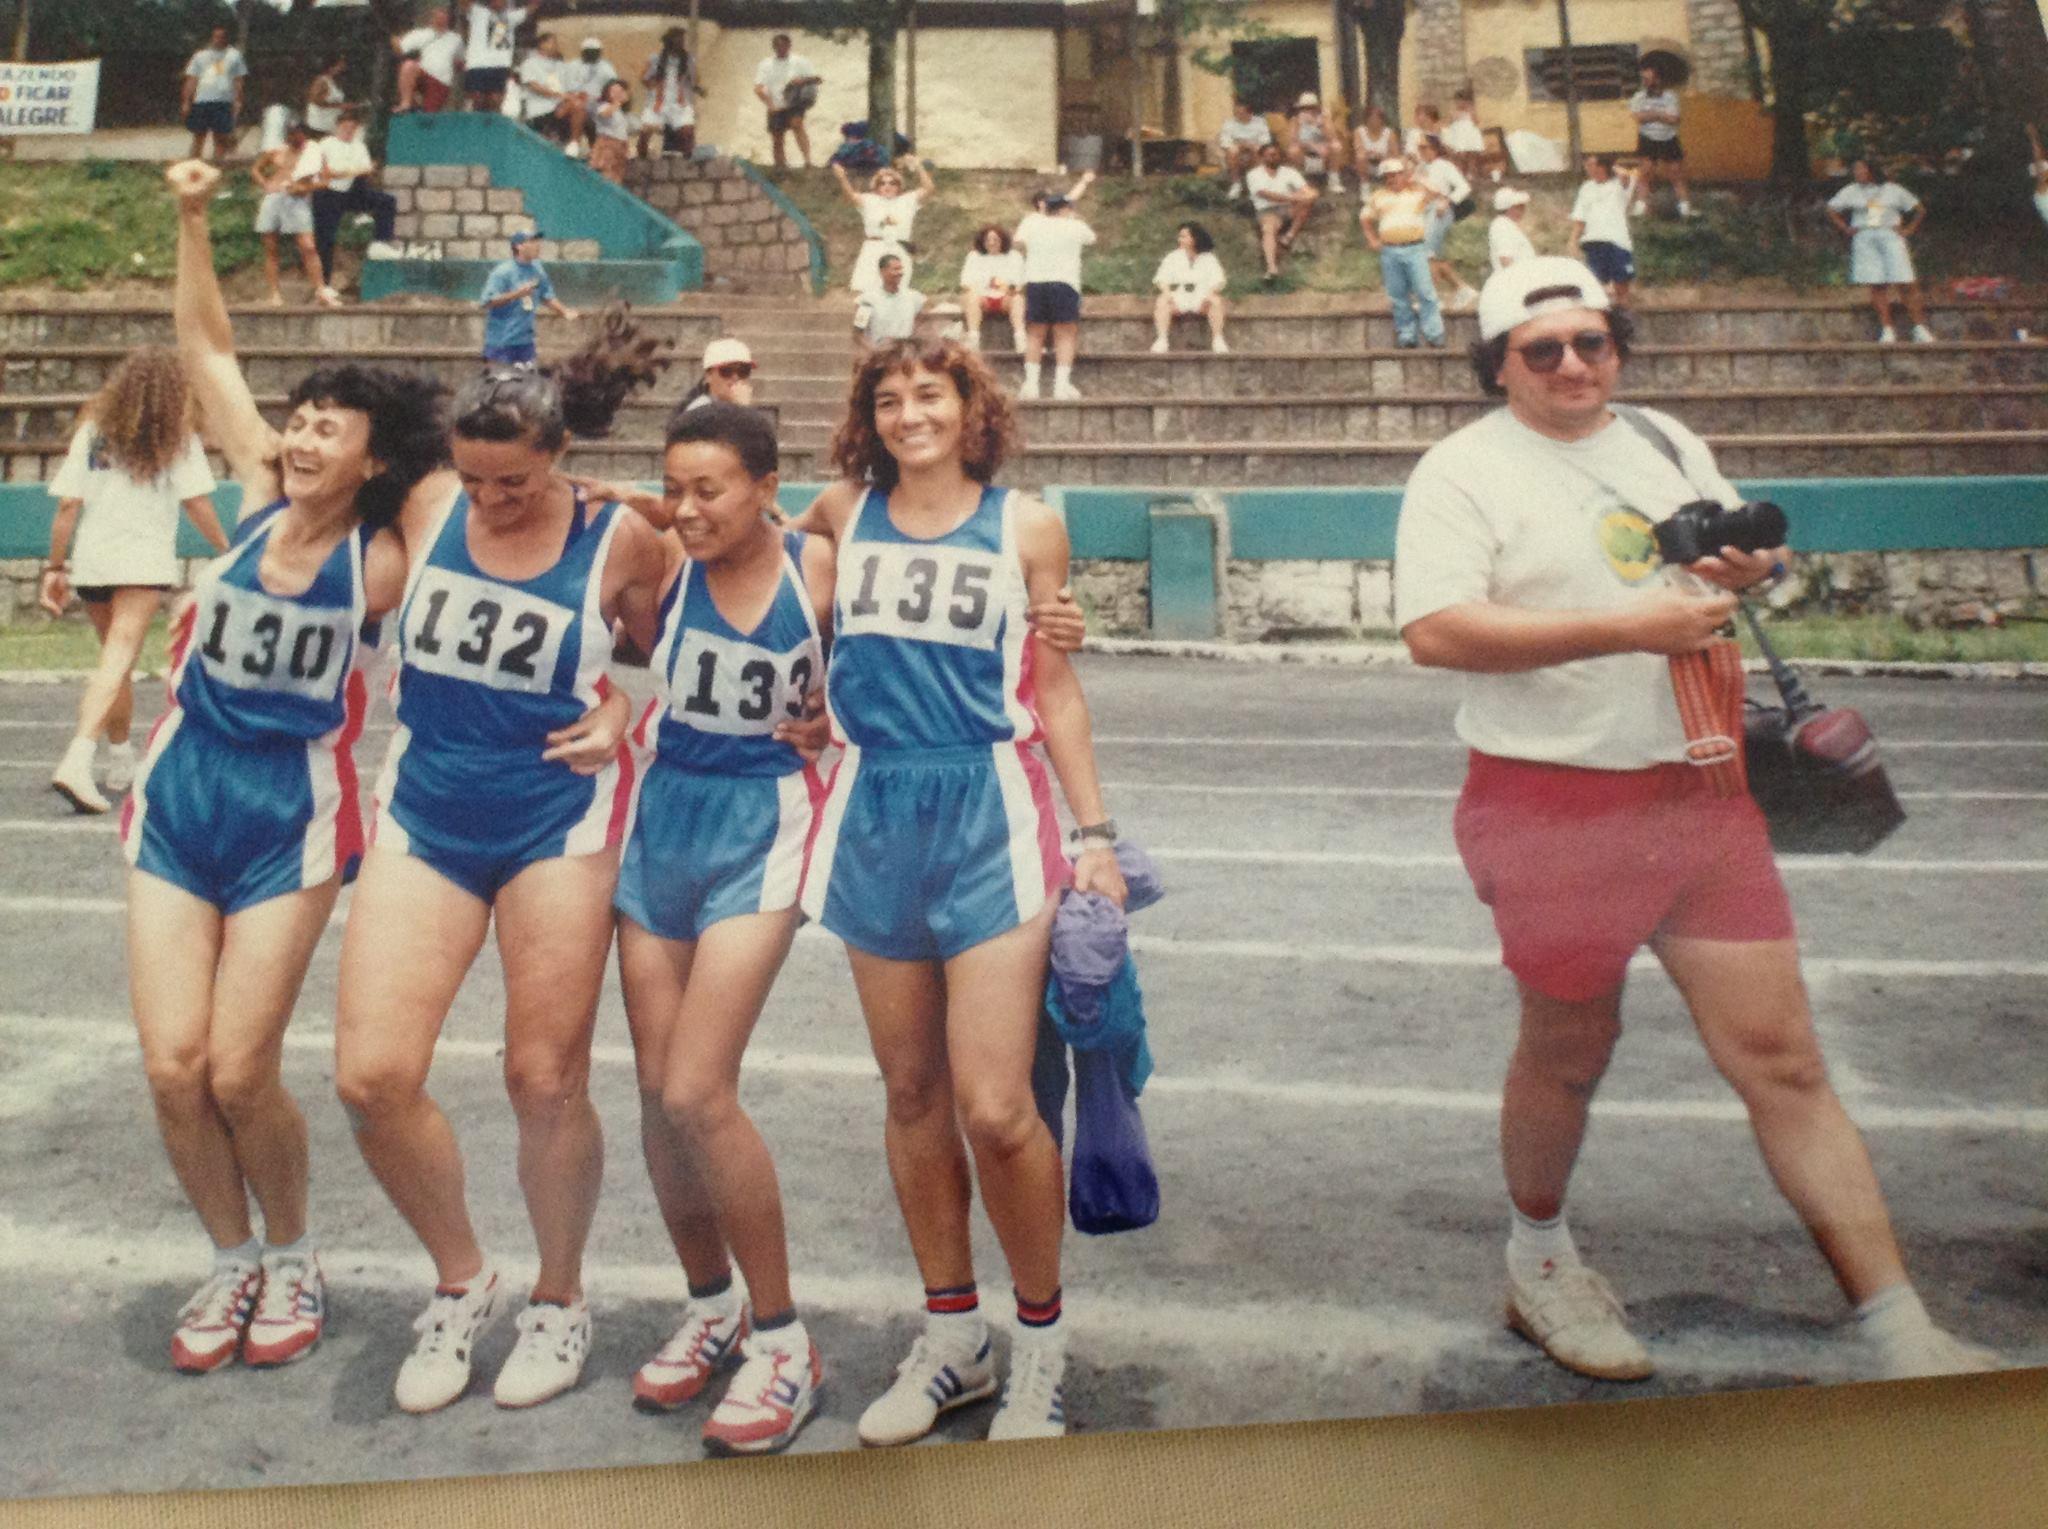 VI JOIDS -1995 PORTO ALEGRE EQUIPE DE ATLETISMO DA BAHIA